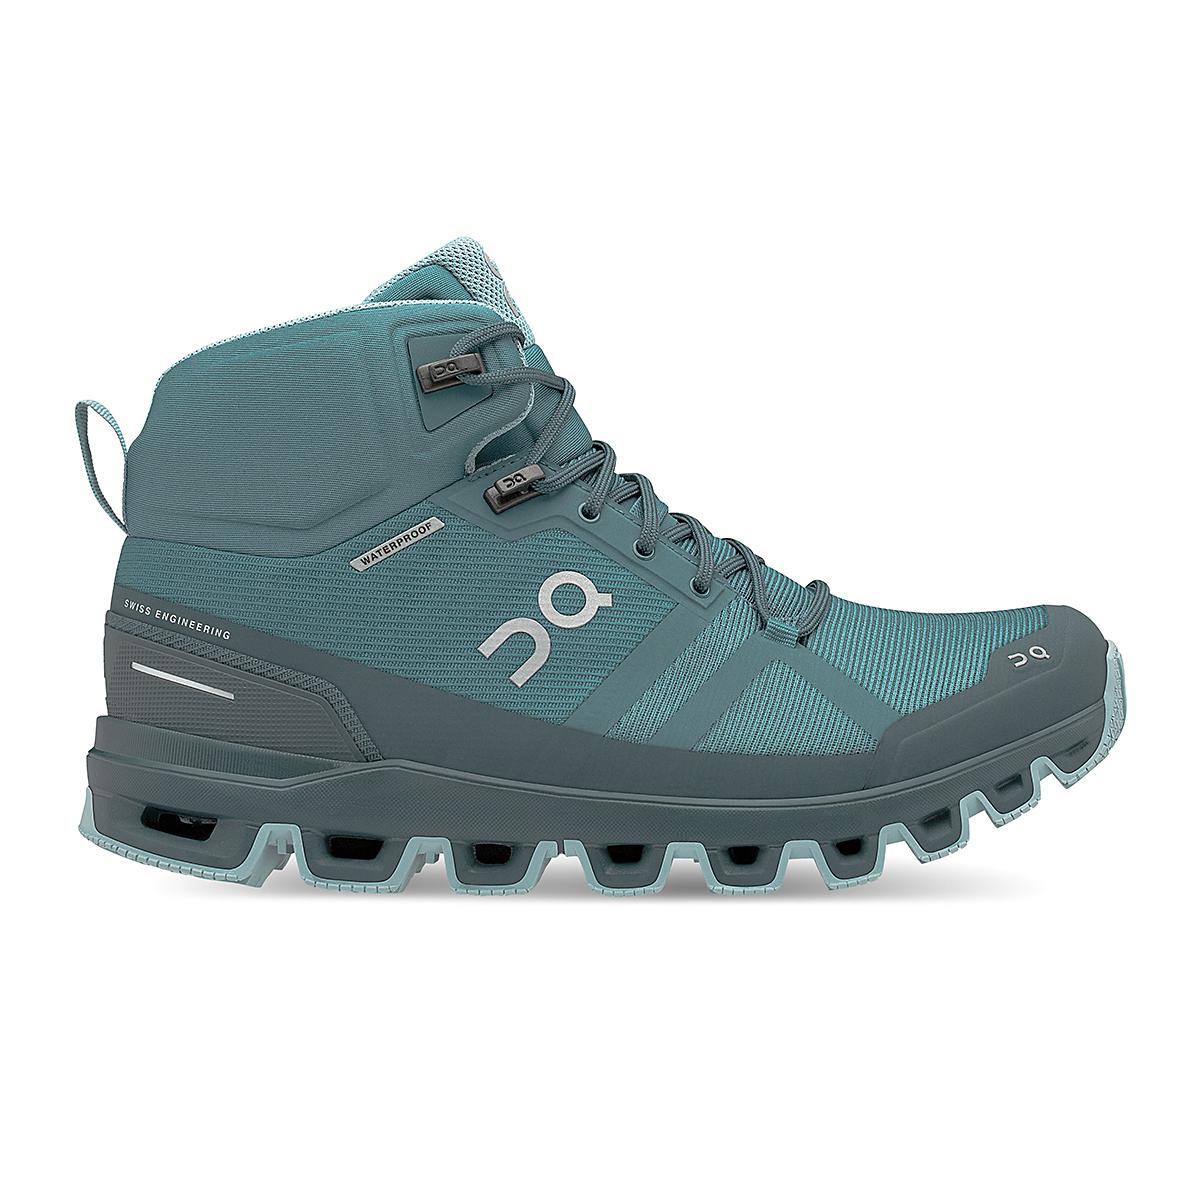 Women's On Cloudrock Waterproof Trail Running Shoe, , large, image 1